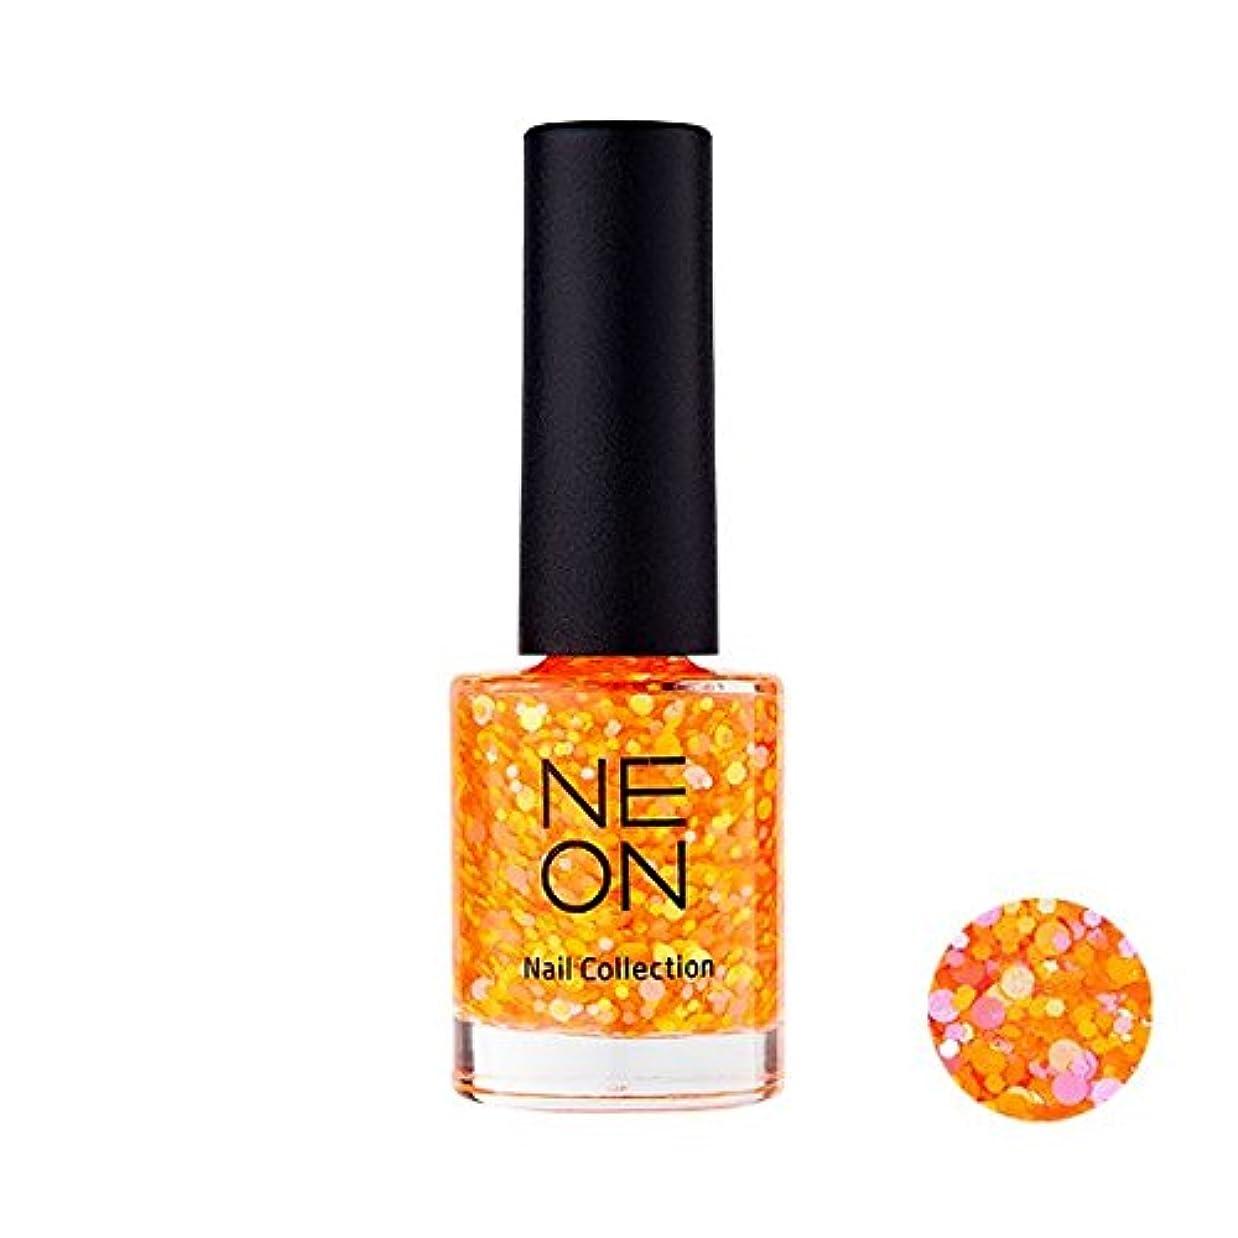 It'S SKIN Neon nail collection [03 Neon Glitter Orange] イッツスキン ネオンネイルコレクション [03 ネオン グリッター オレンジ] [並行輸入品]